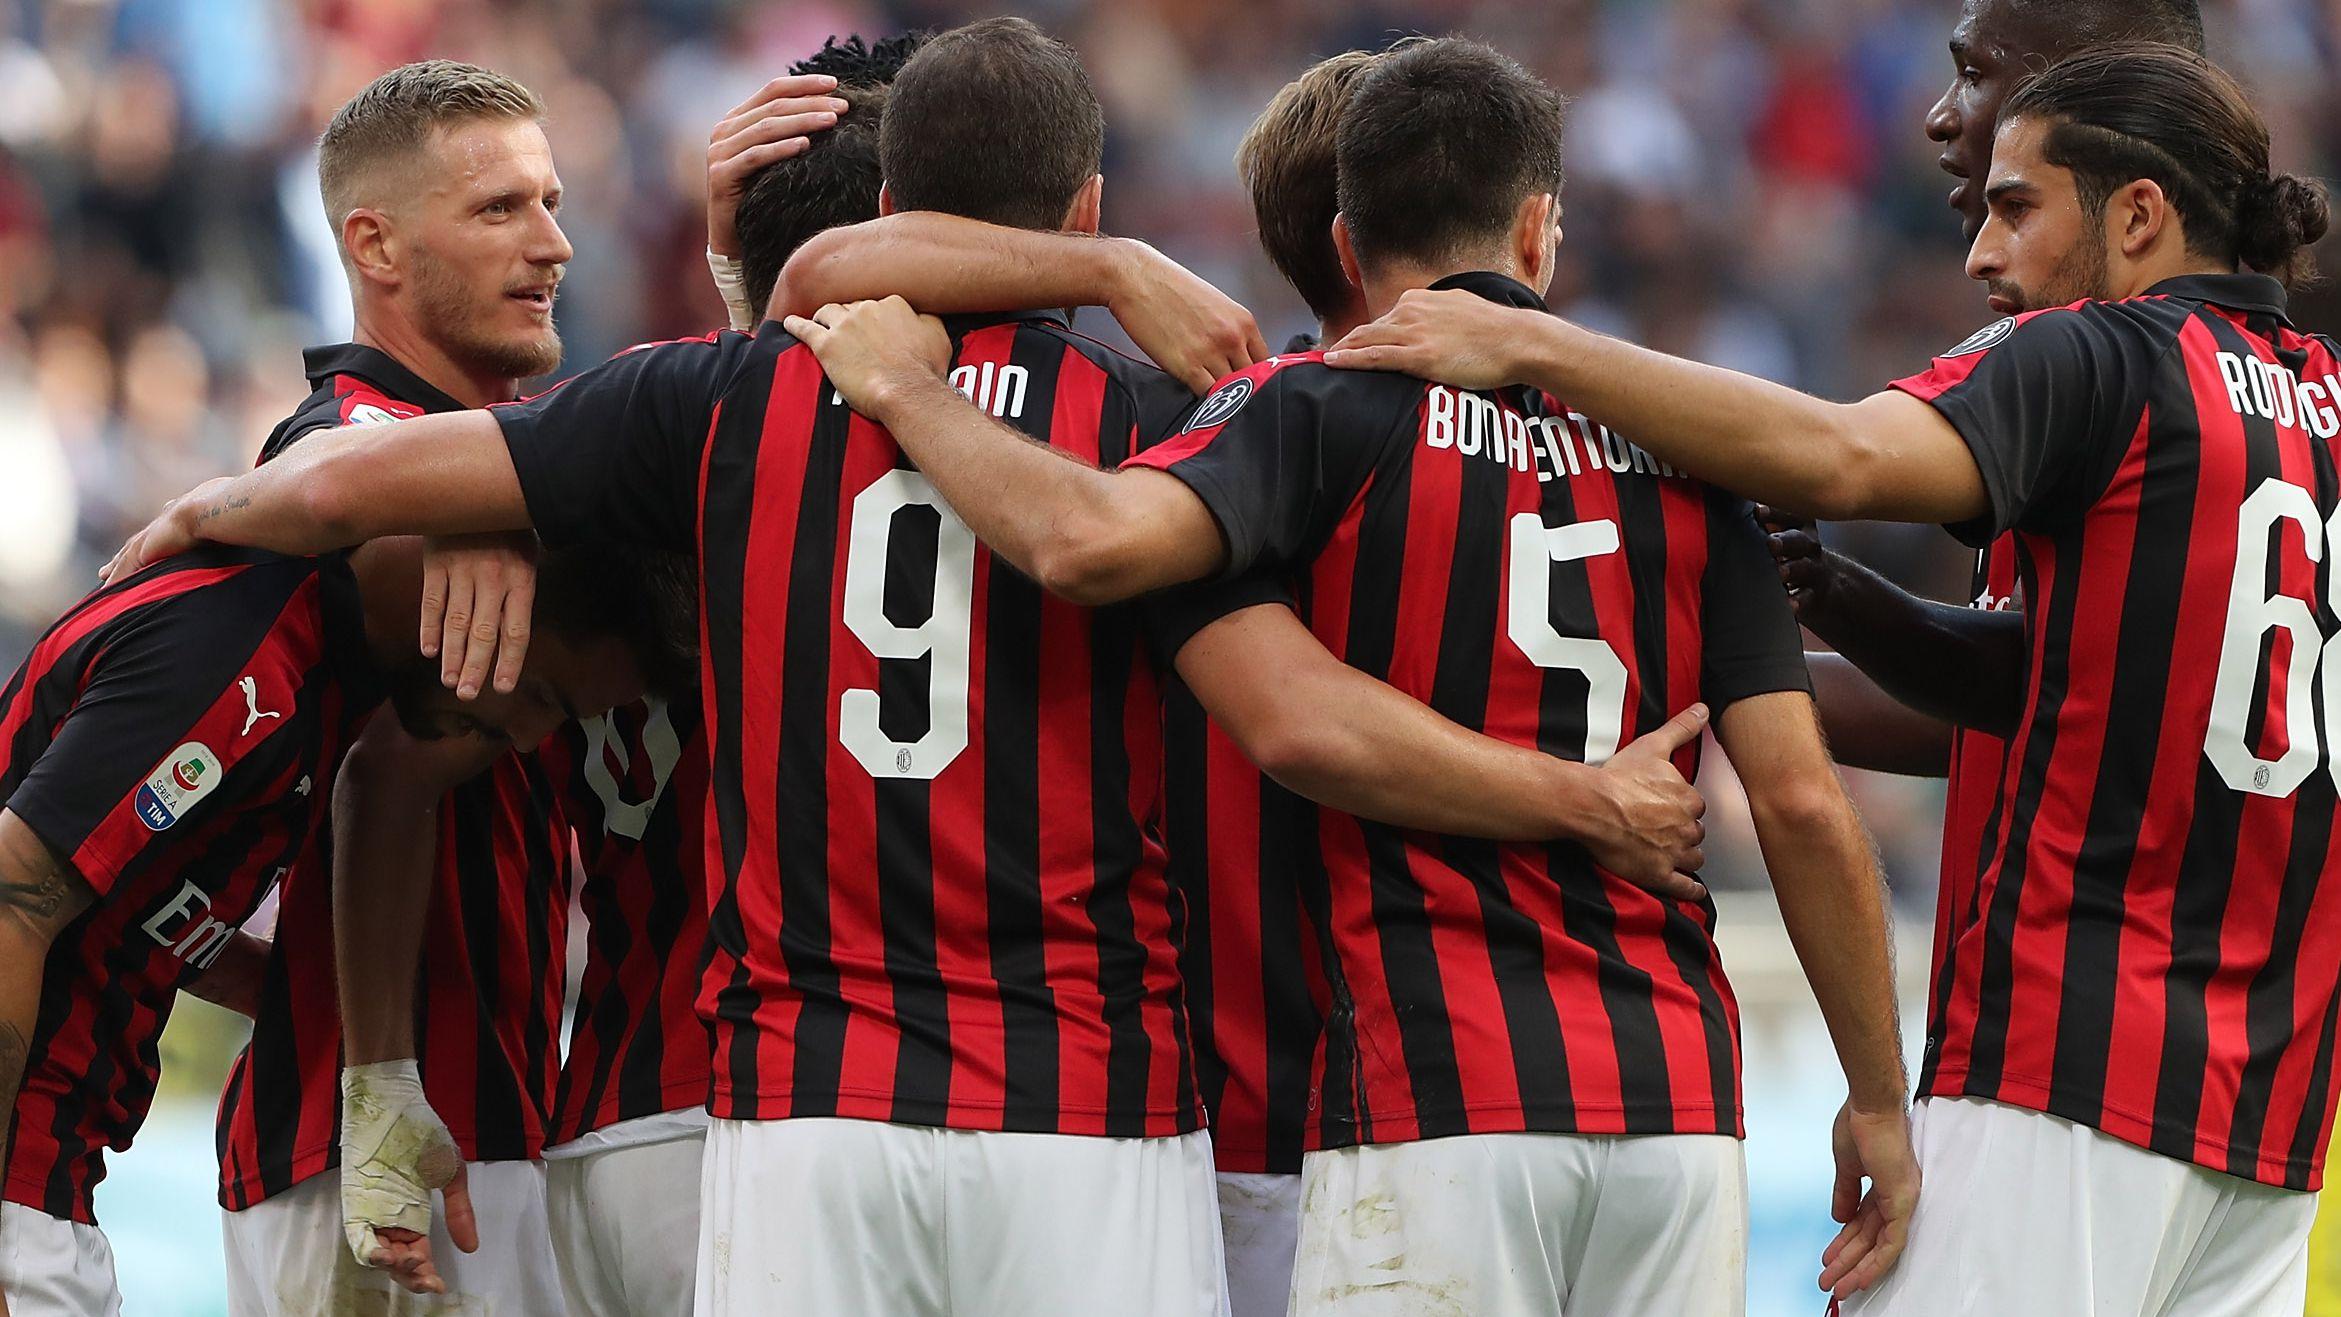 Milan celebrating Chievo